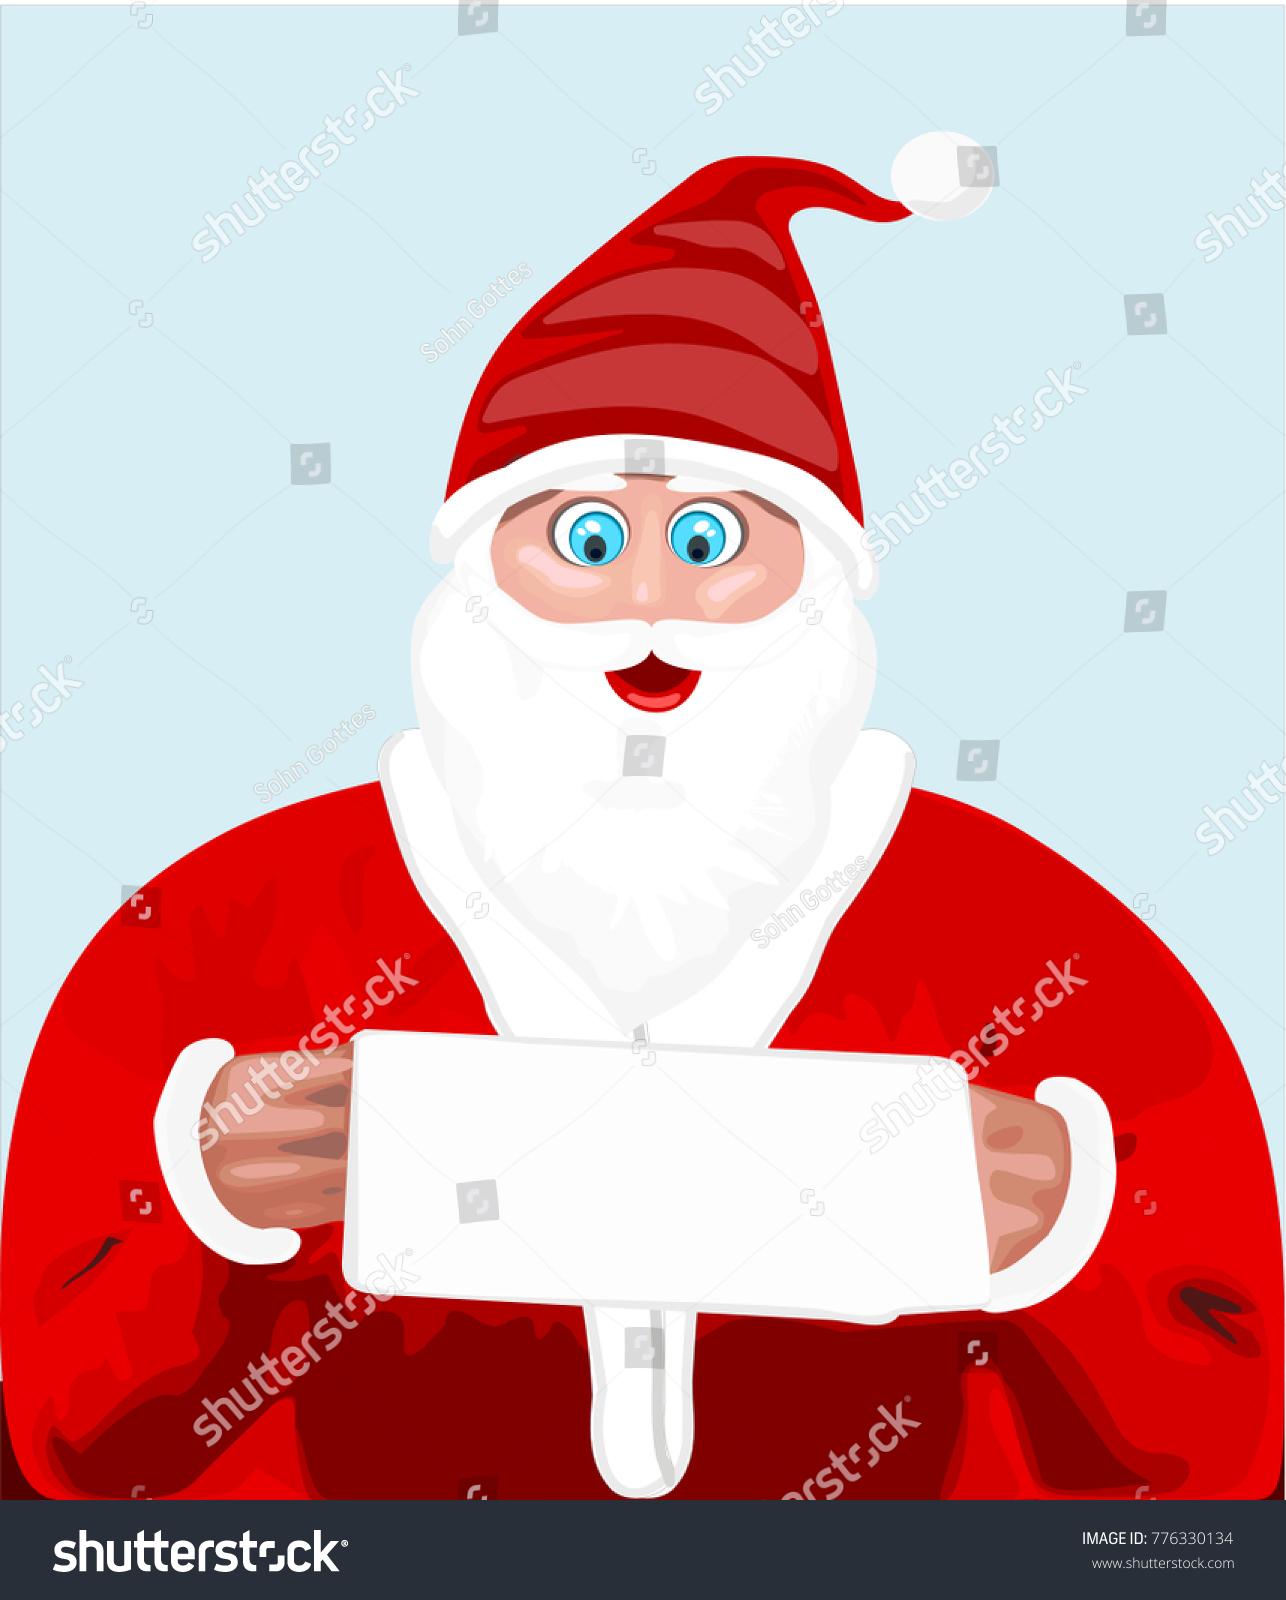 stock-vector-santa-reading-gift-request-